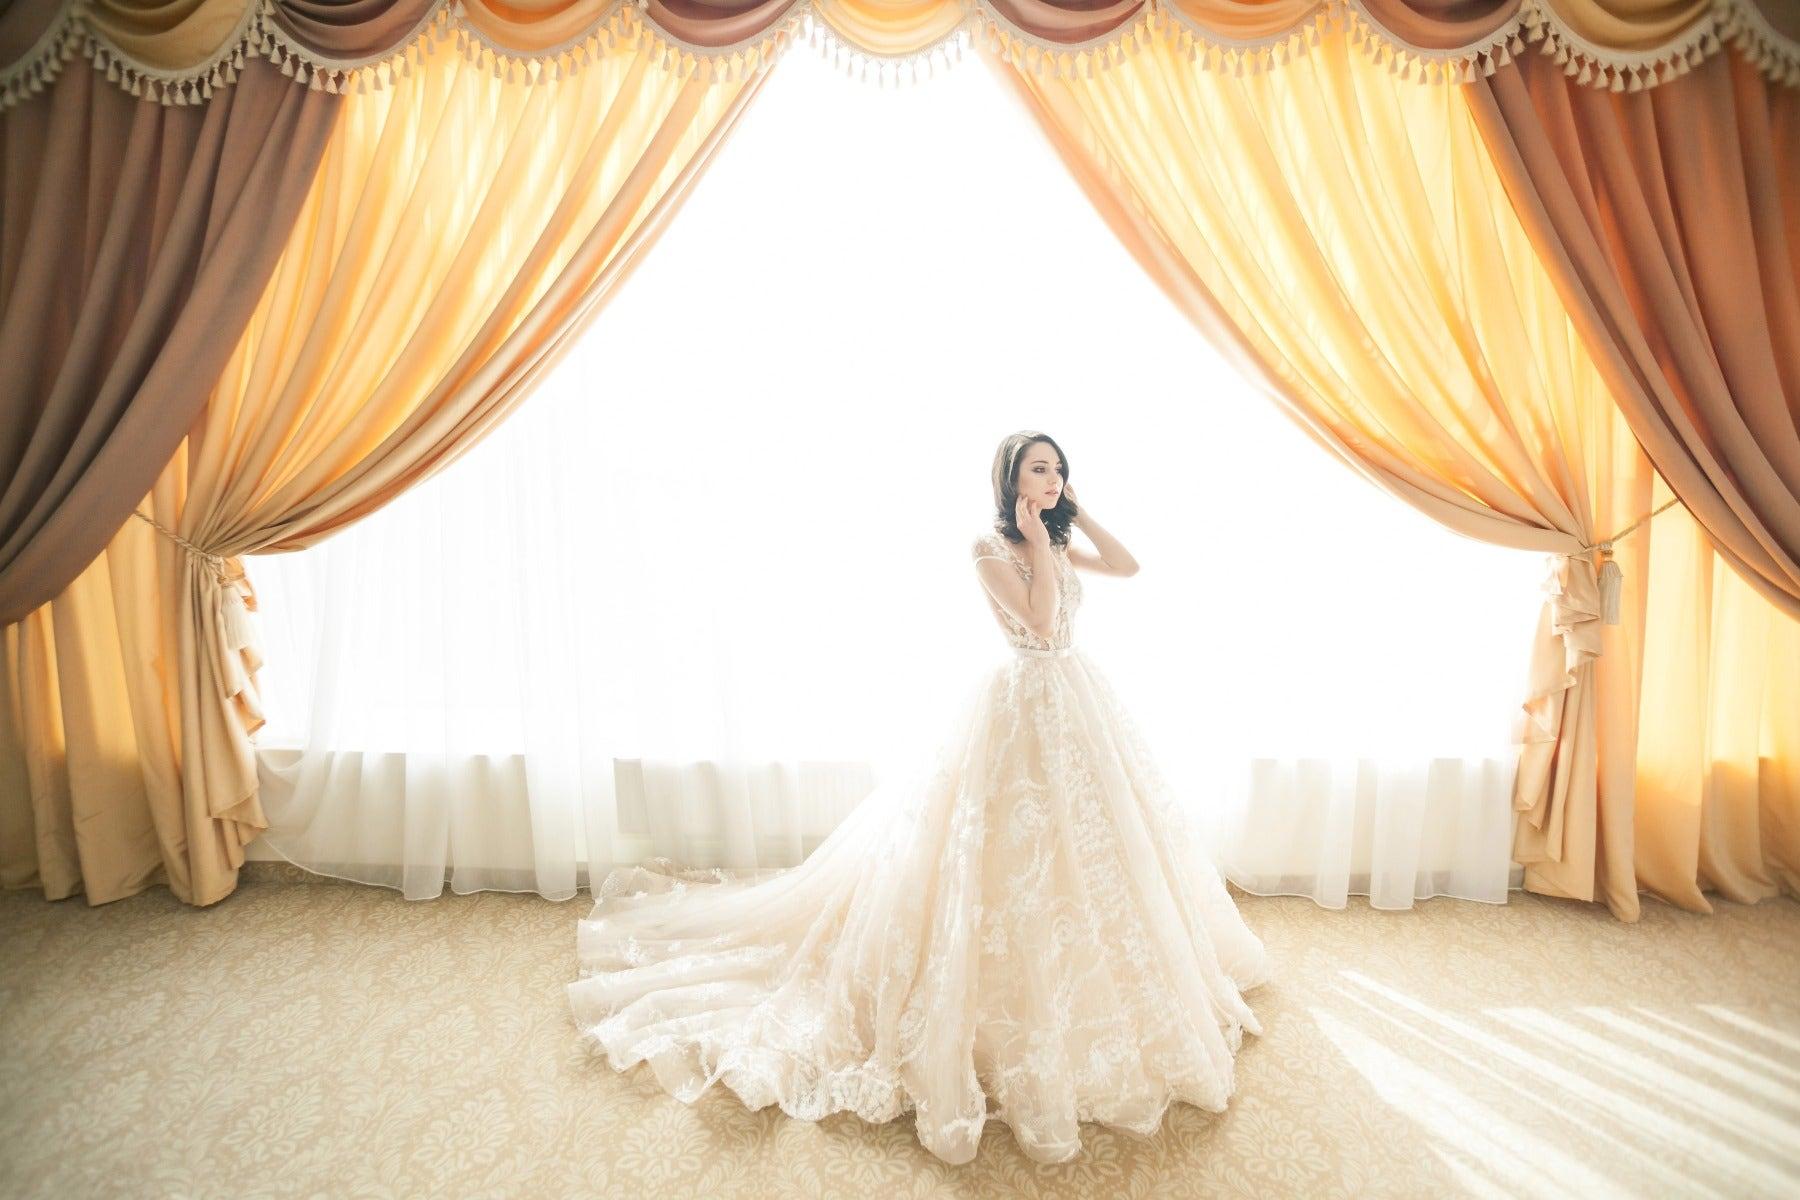 Bride in front of overexposed window